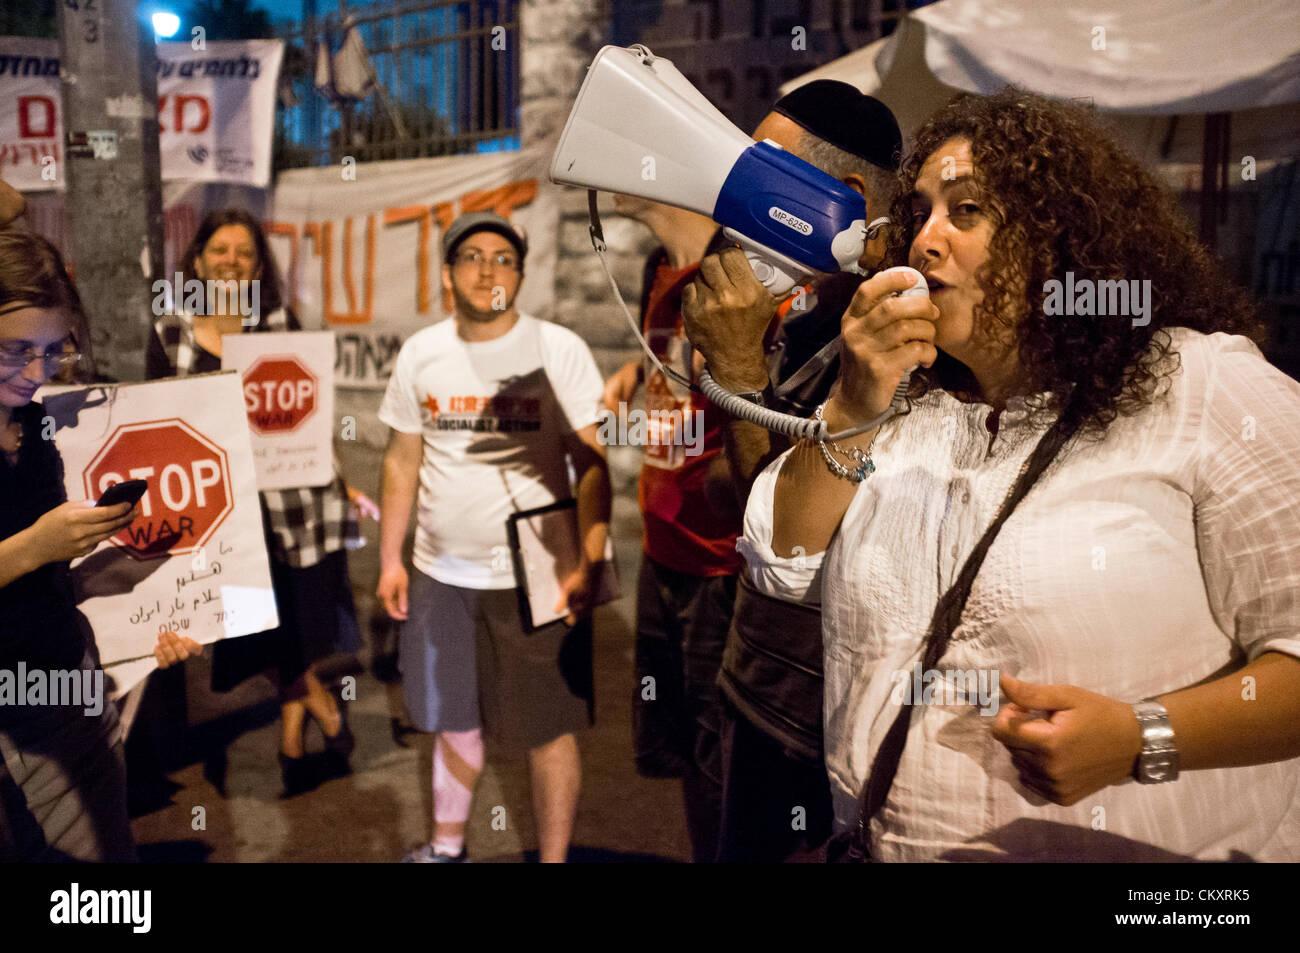 Jerusalem, Israel. 30th Aug 2012. Egyptian-born, British, Palestinian, Manal Timraz, 42, joins Israeli peace advocators. - Stock Image